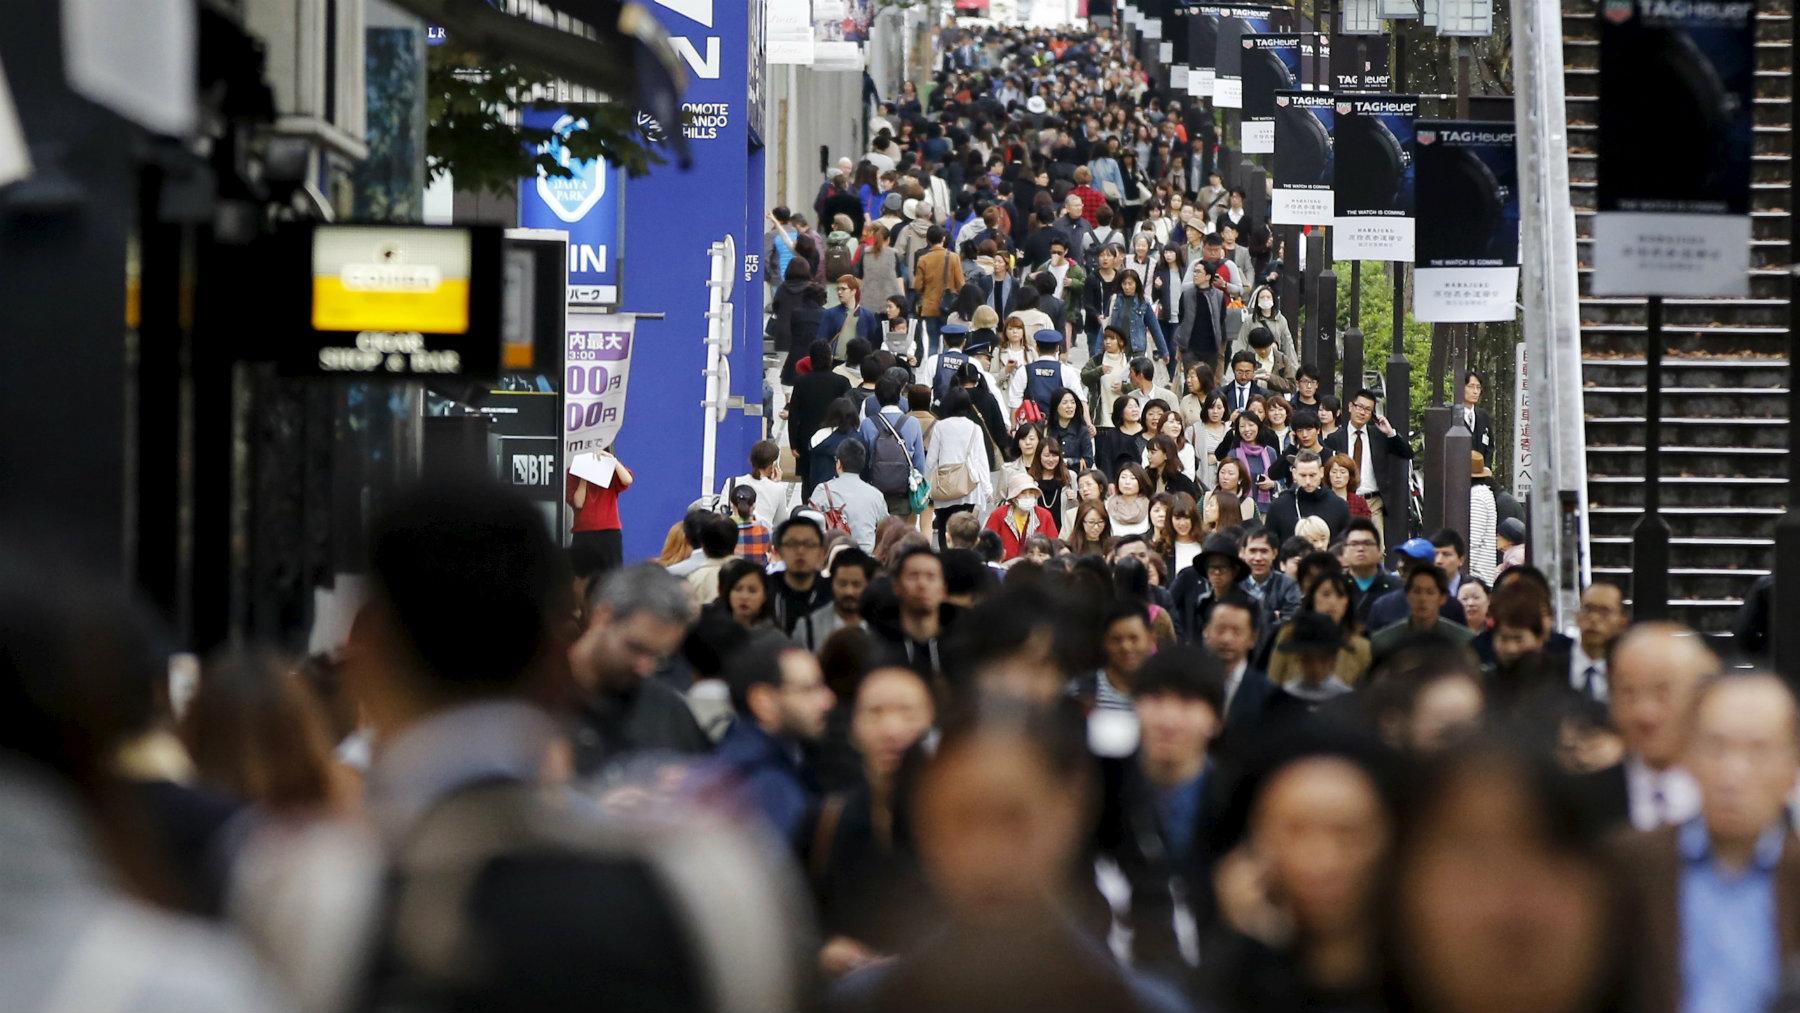 People walk in Tokyo's Omotesando shopping district, Japan, November 11, 2015. REUTERS/Toru Hanai